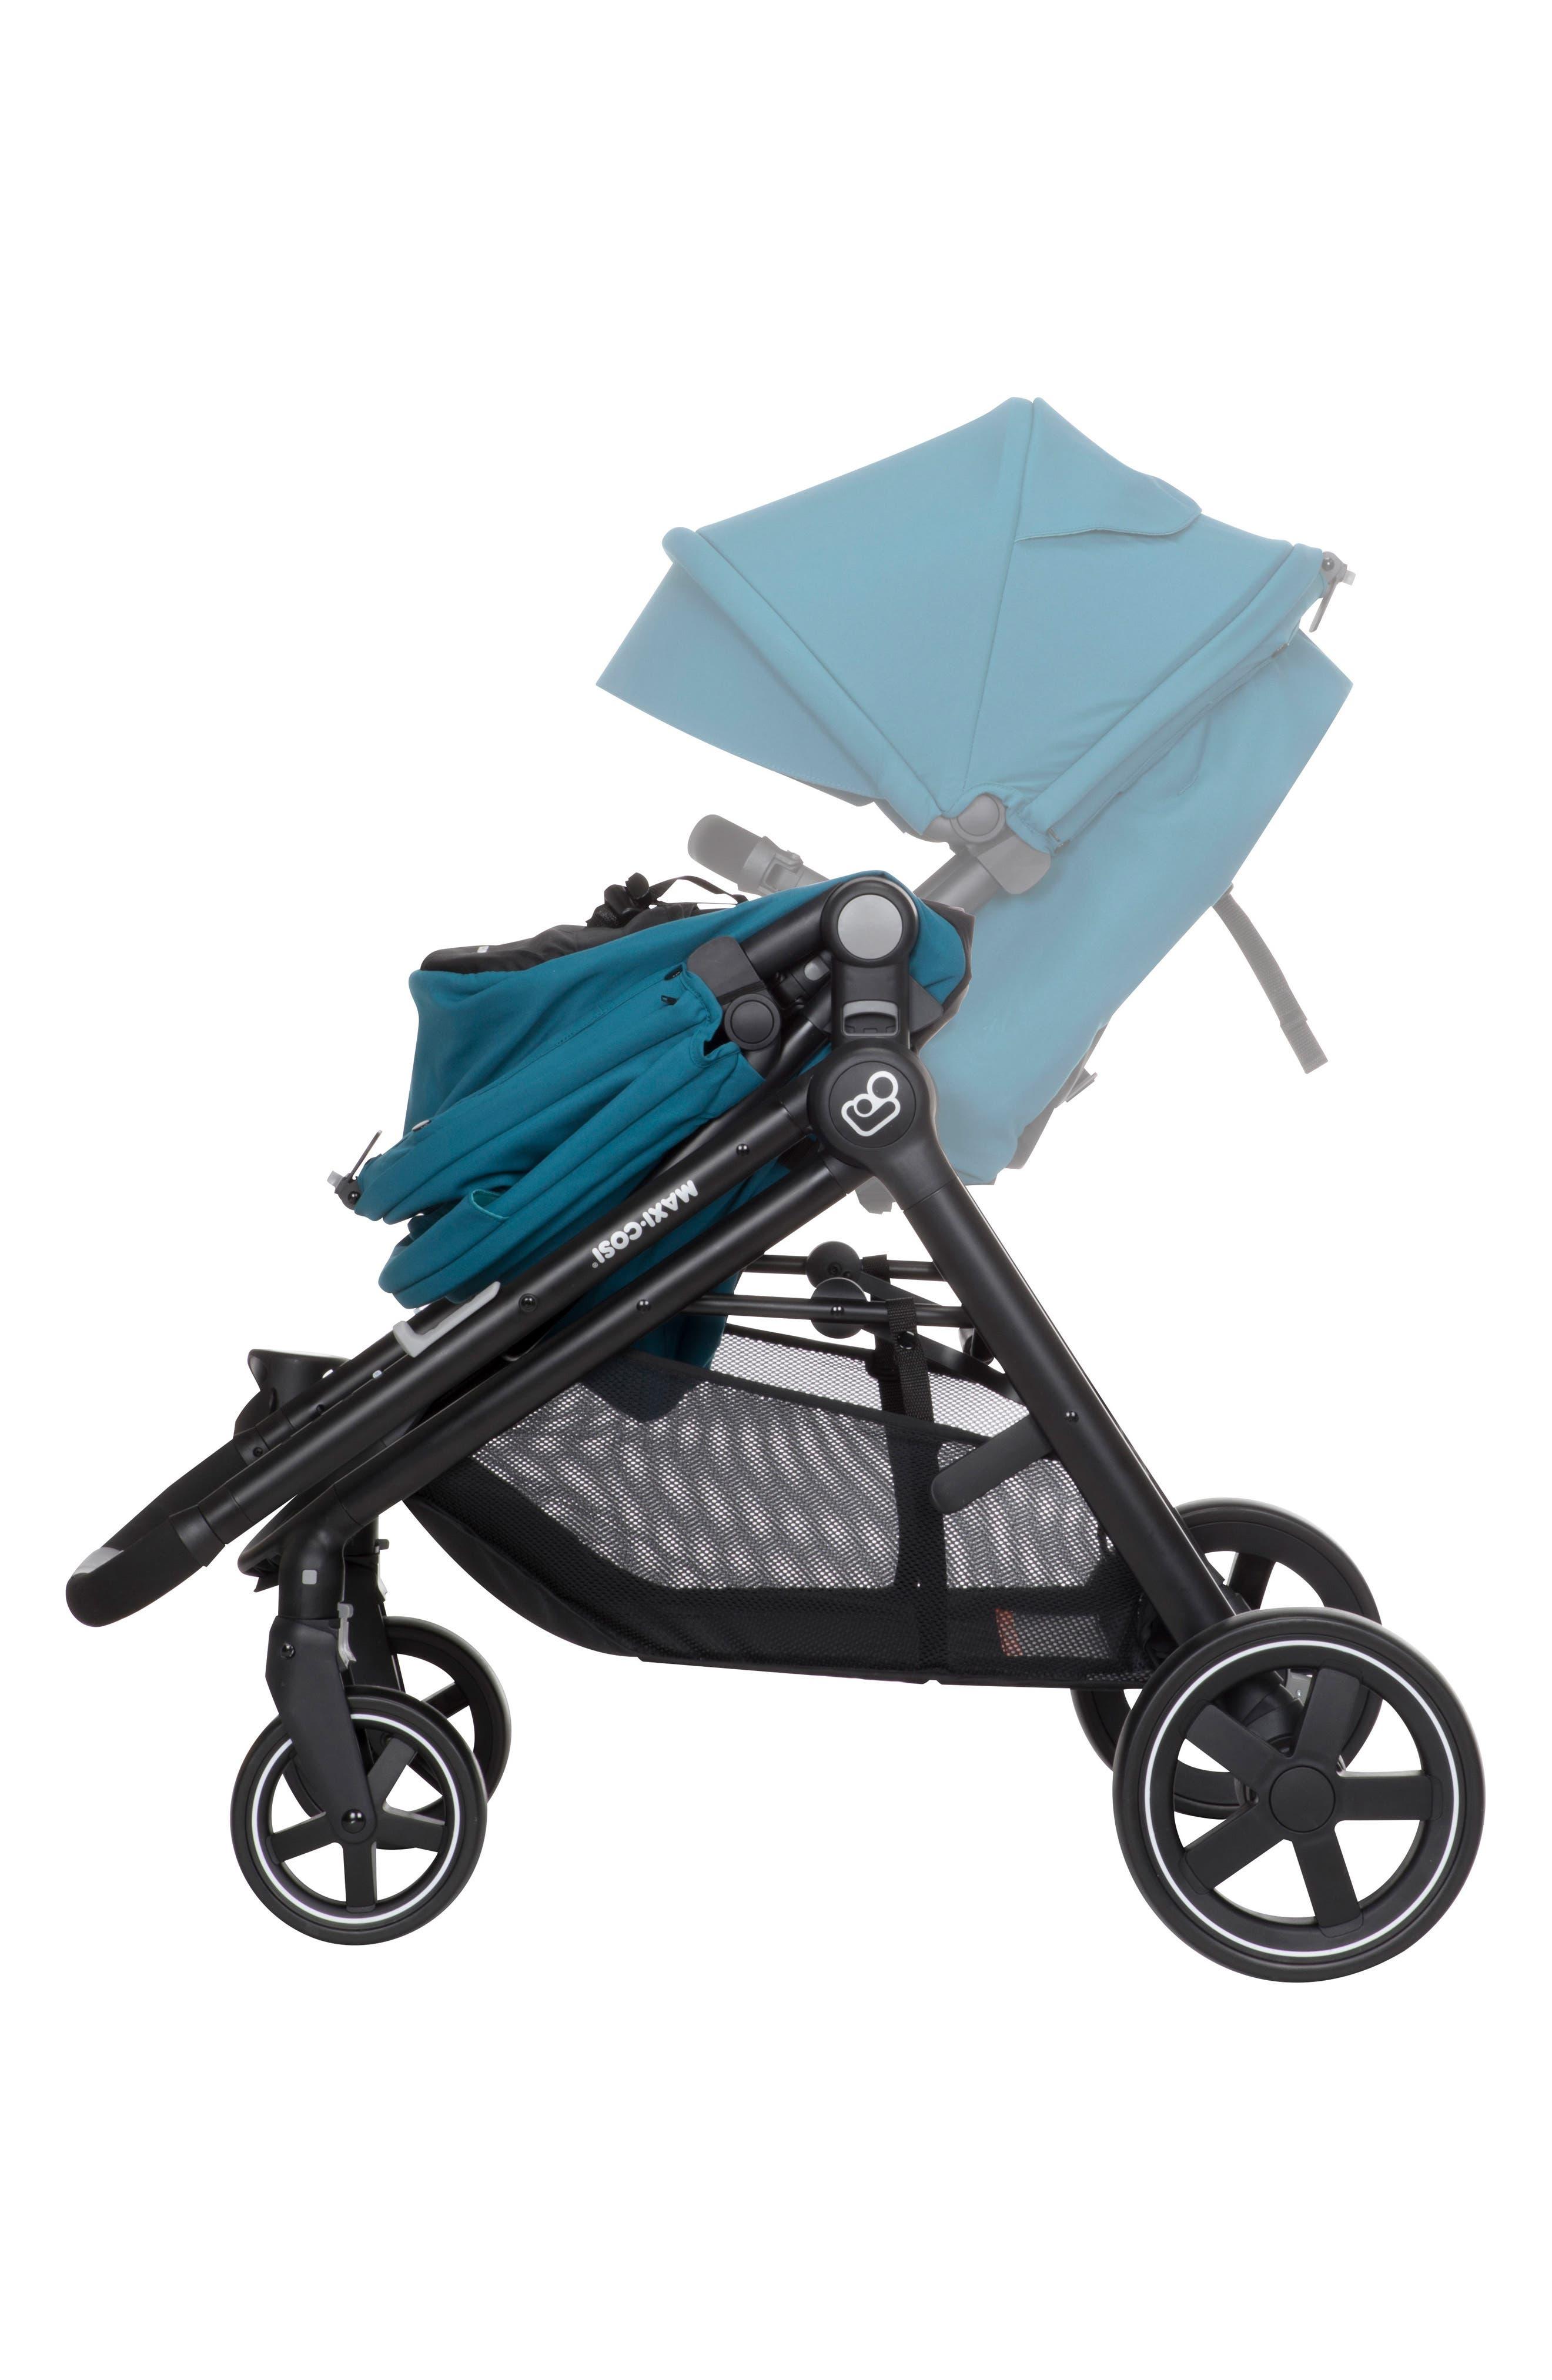 5-1 Mico 30 Infant Car Seat & Zelia Stroller Modular Travel System,                             Alternate thumbnail 6, color,                             Emerald Tide